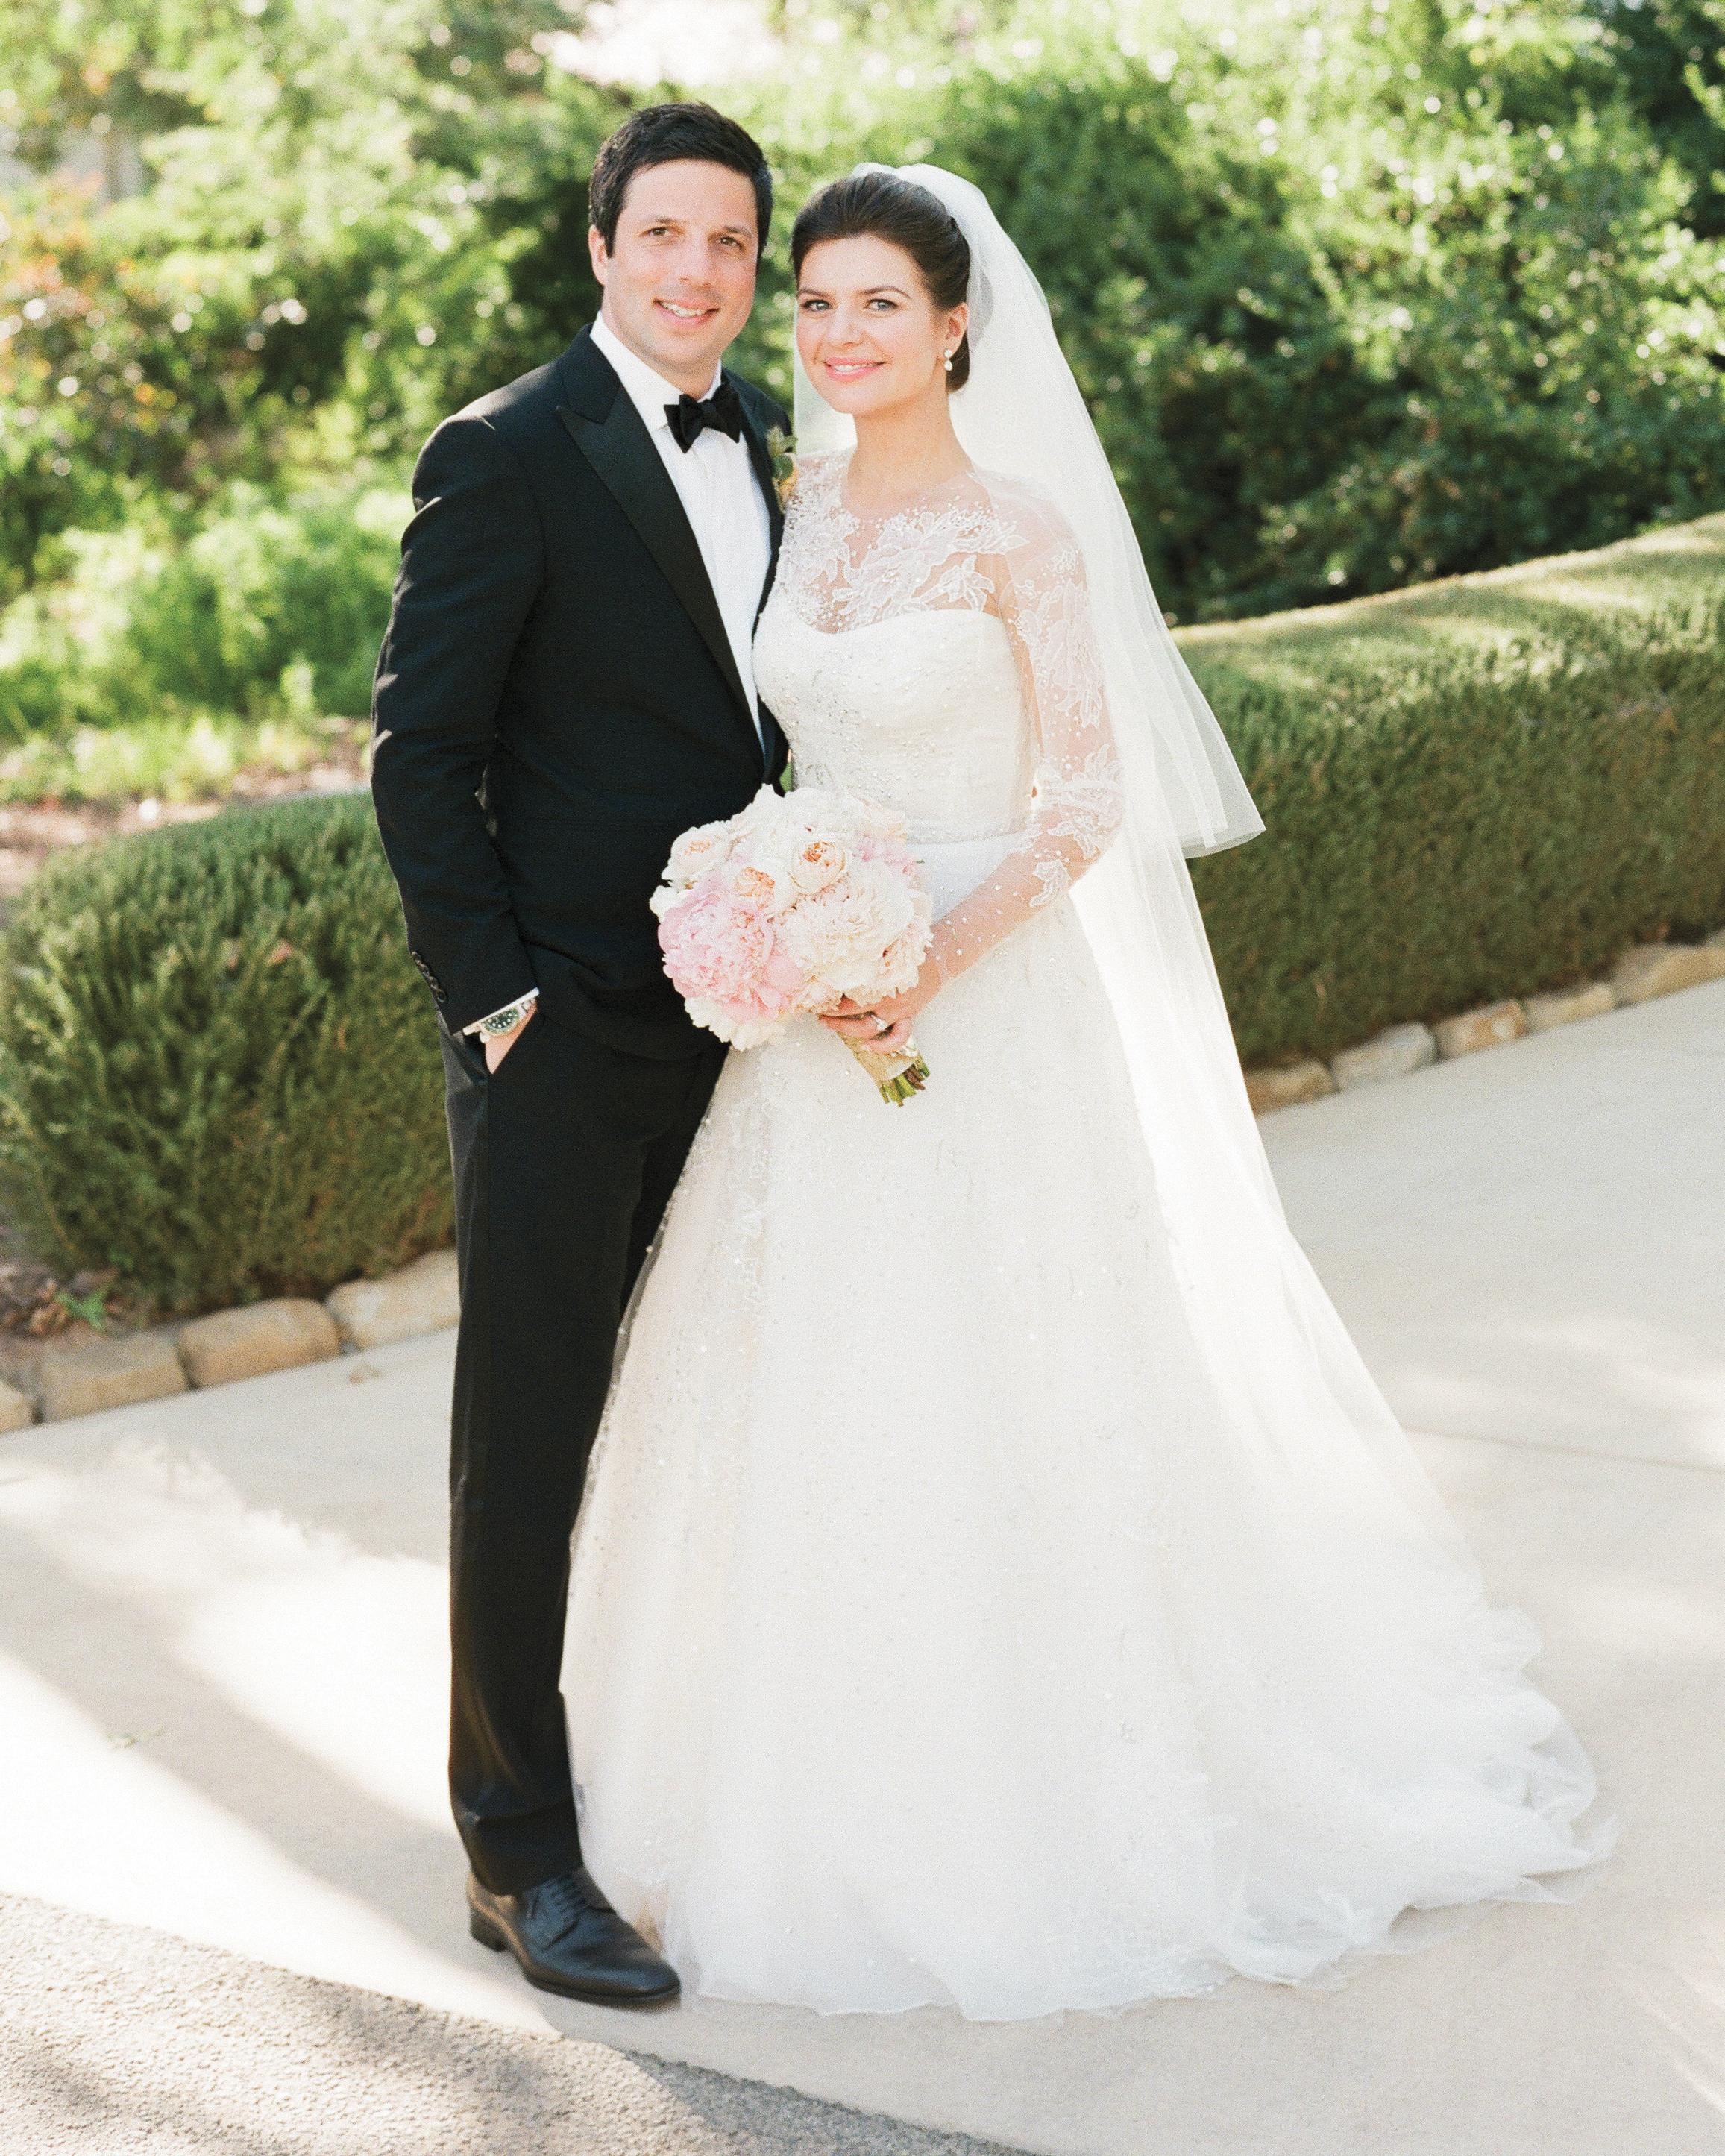 casey-david-wedding-ojai-0637-s111709.jpg